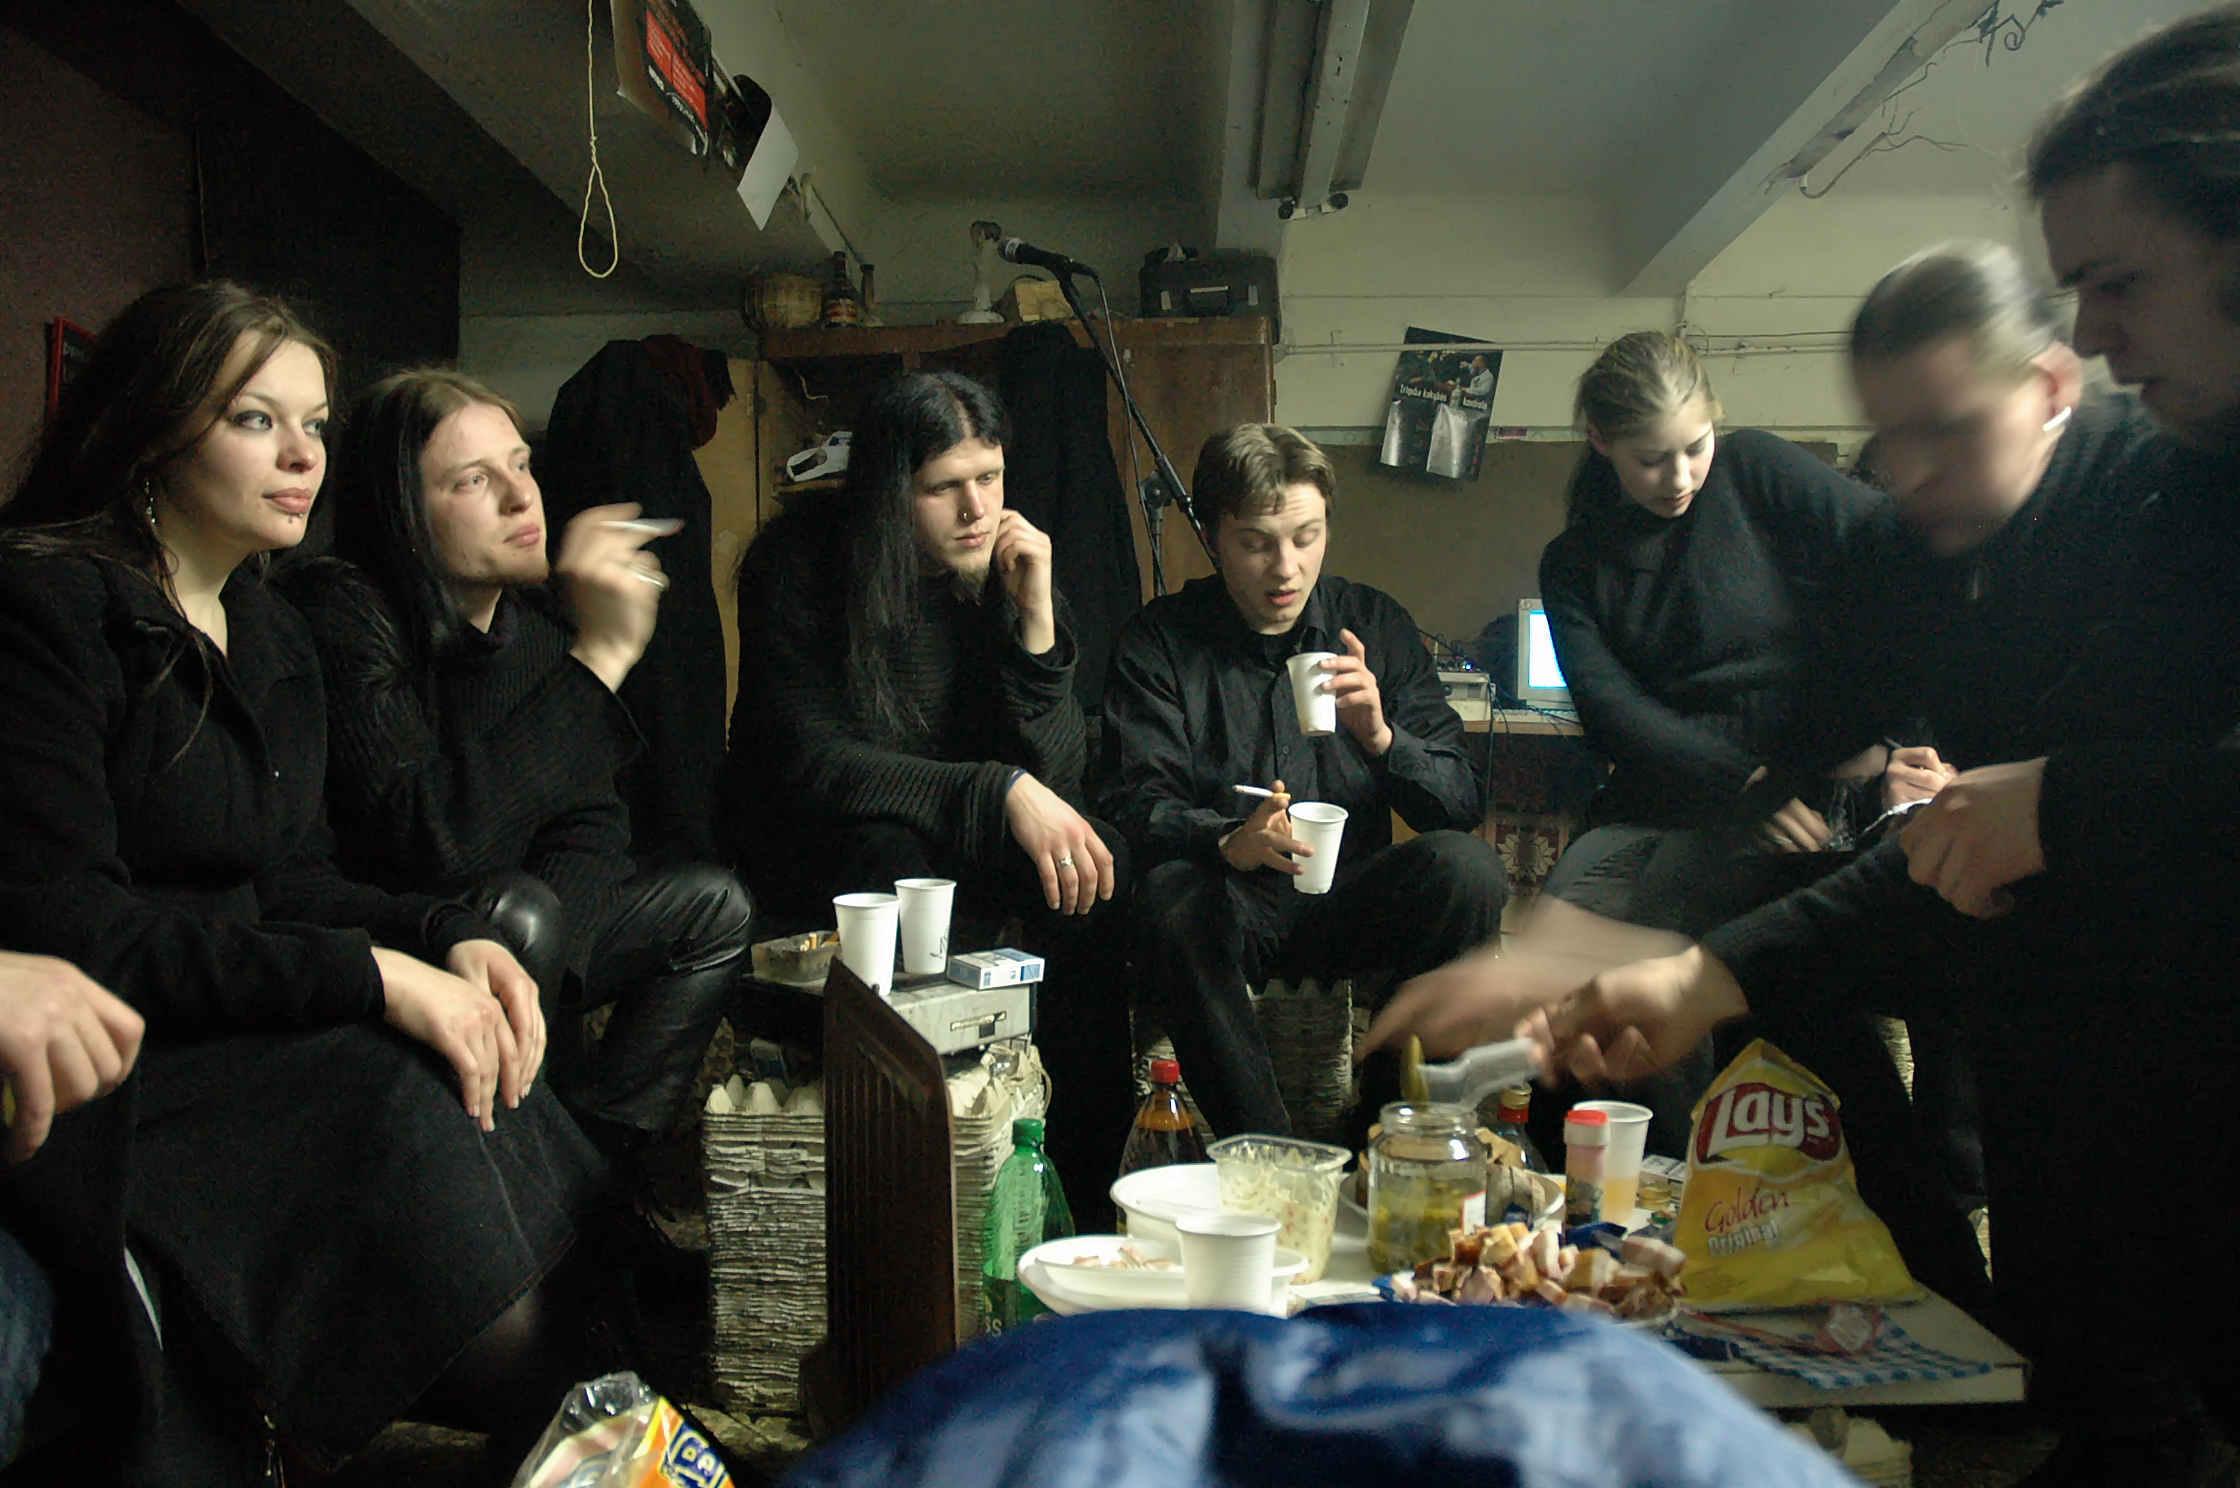 goth_party_by_bludlivijkot